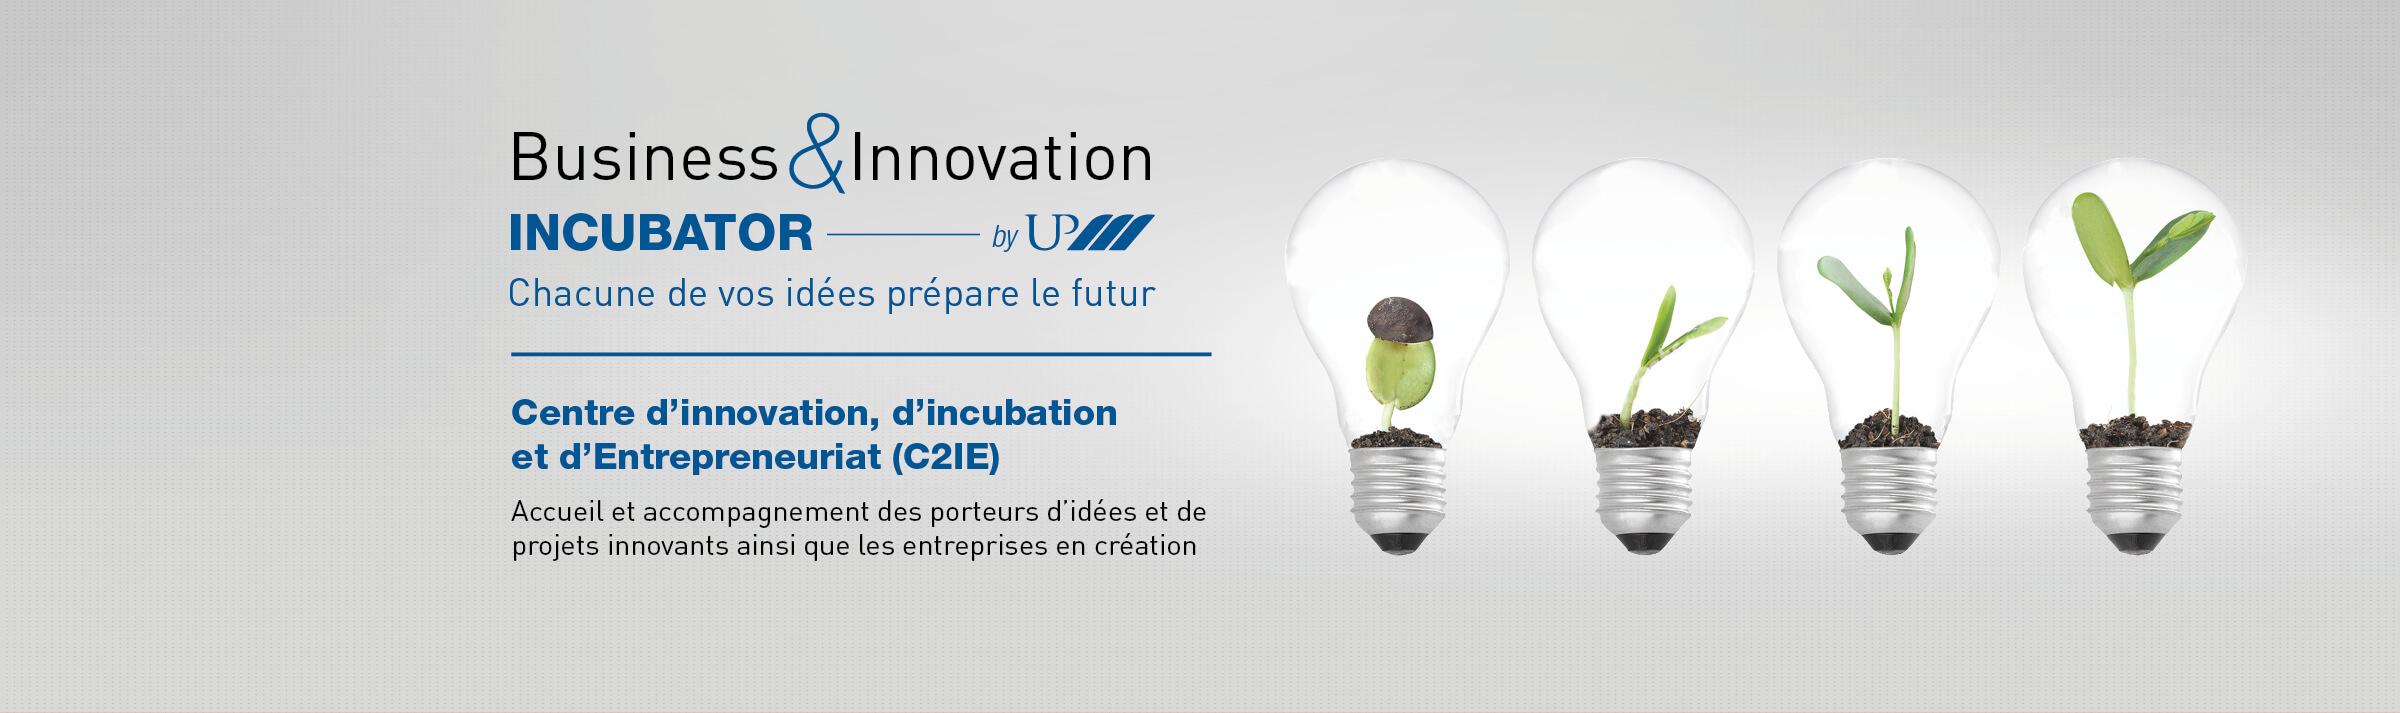 Couv incubator - 2